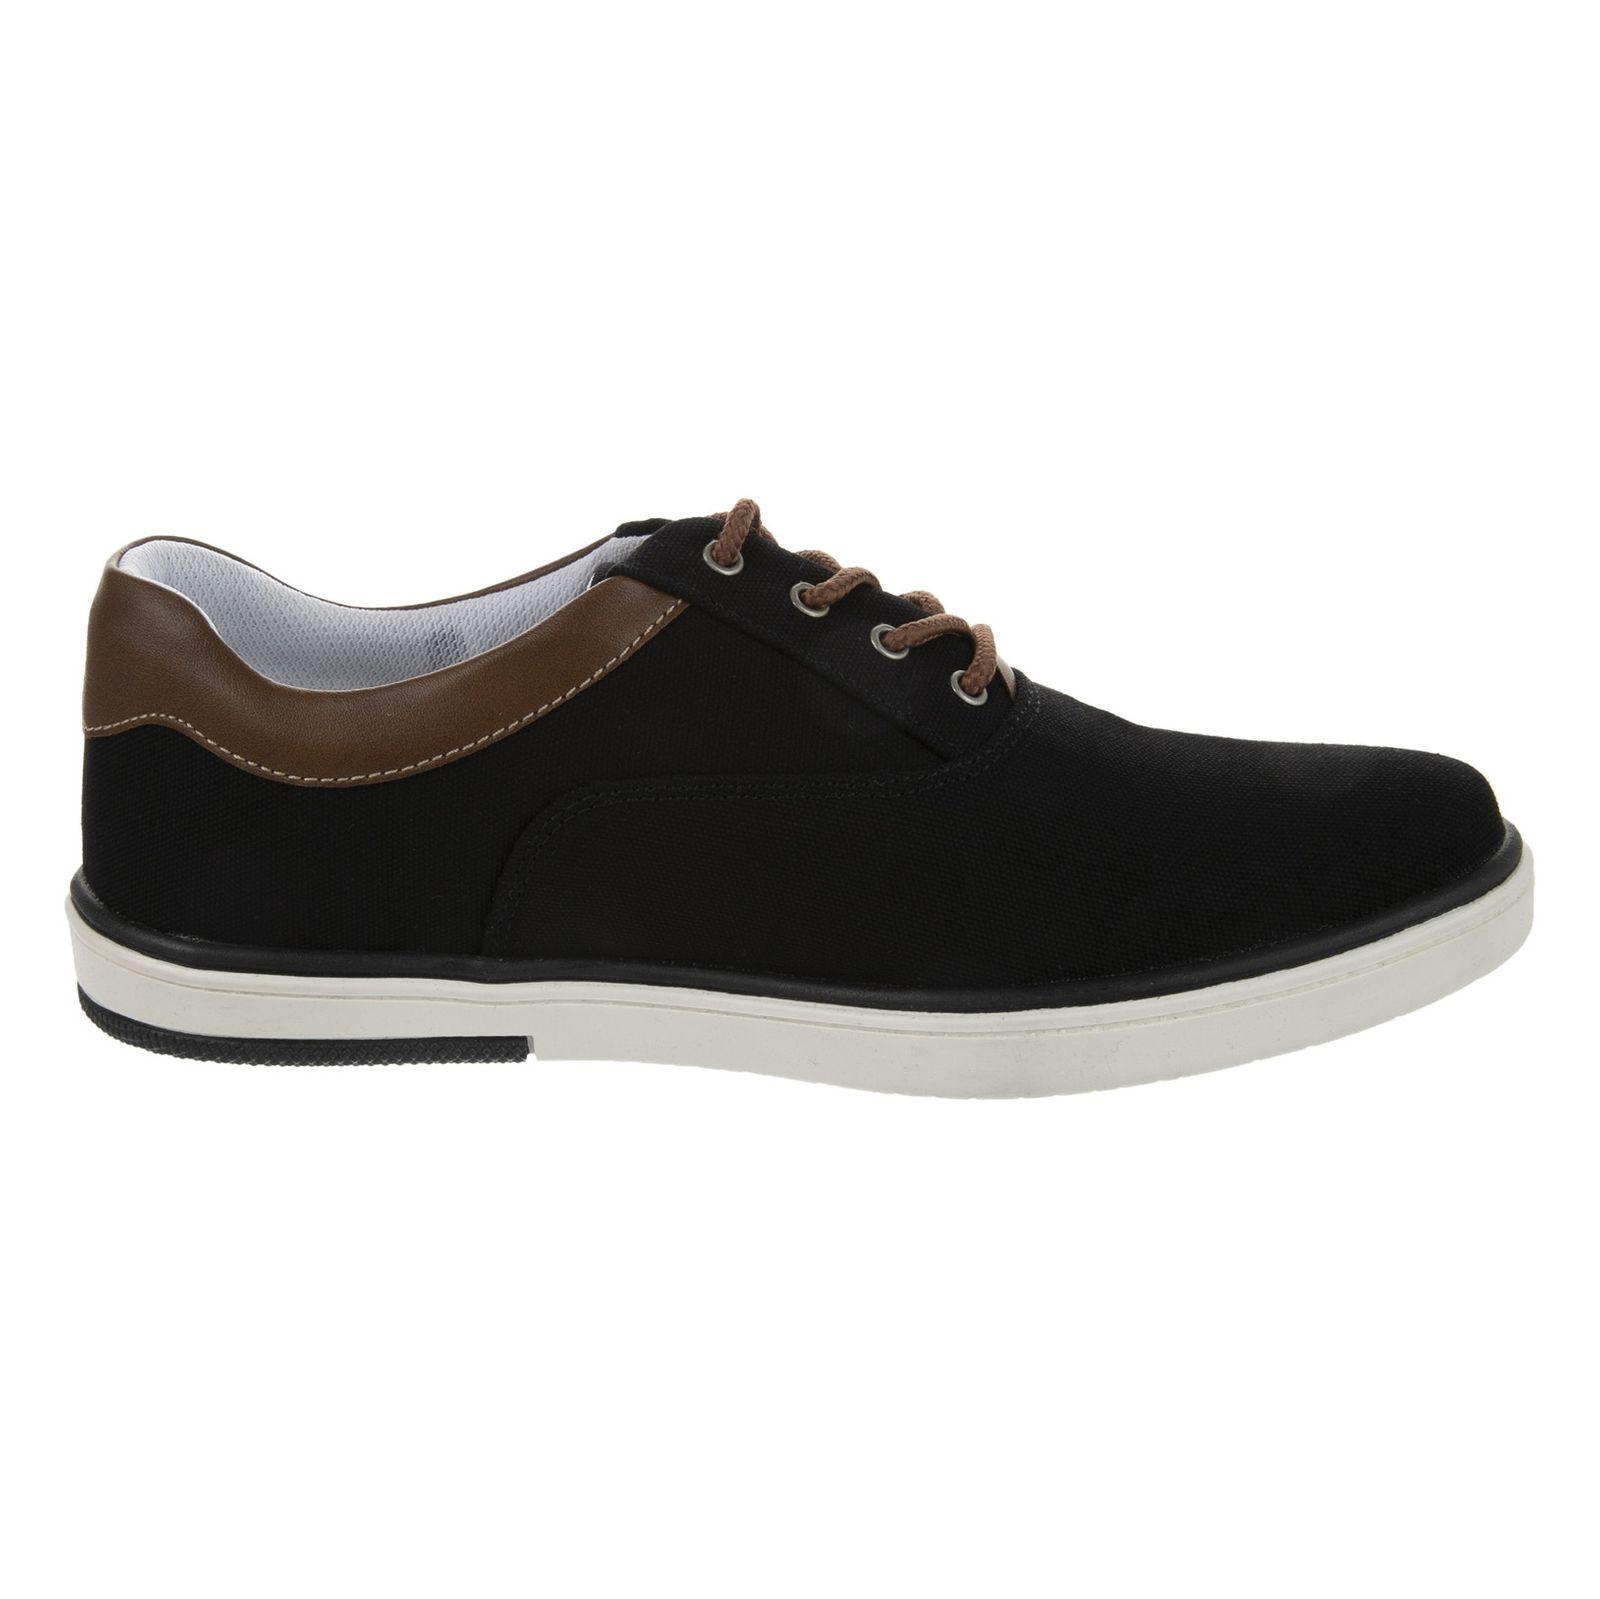 کفش روزمره مردانه داکرز مدل 100234016-BL -  - 2